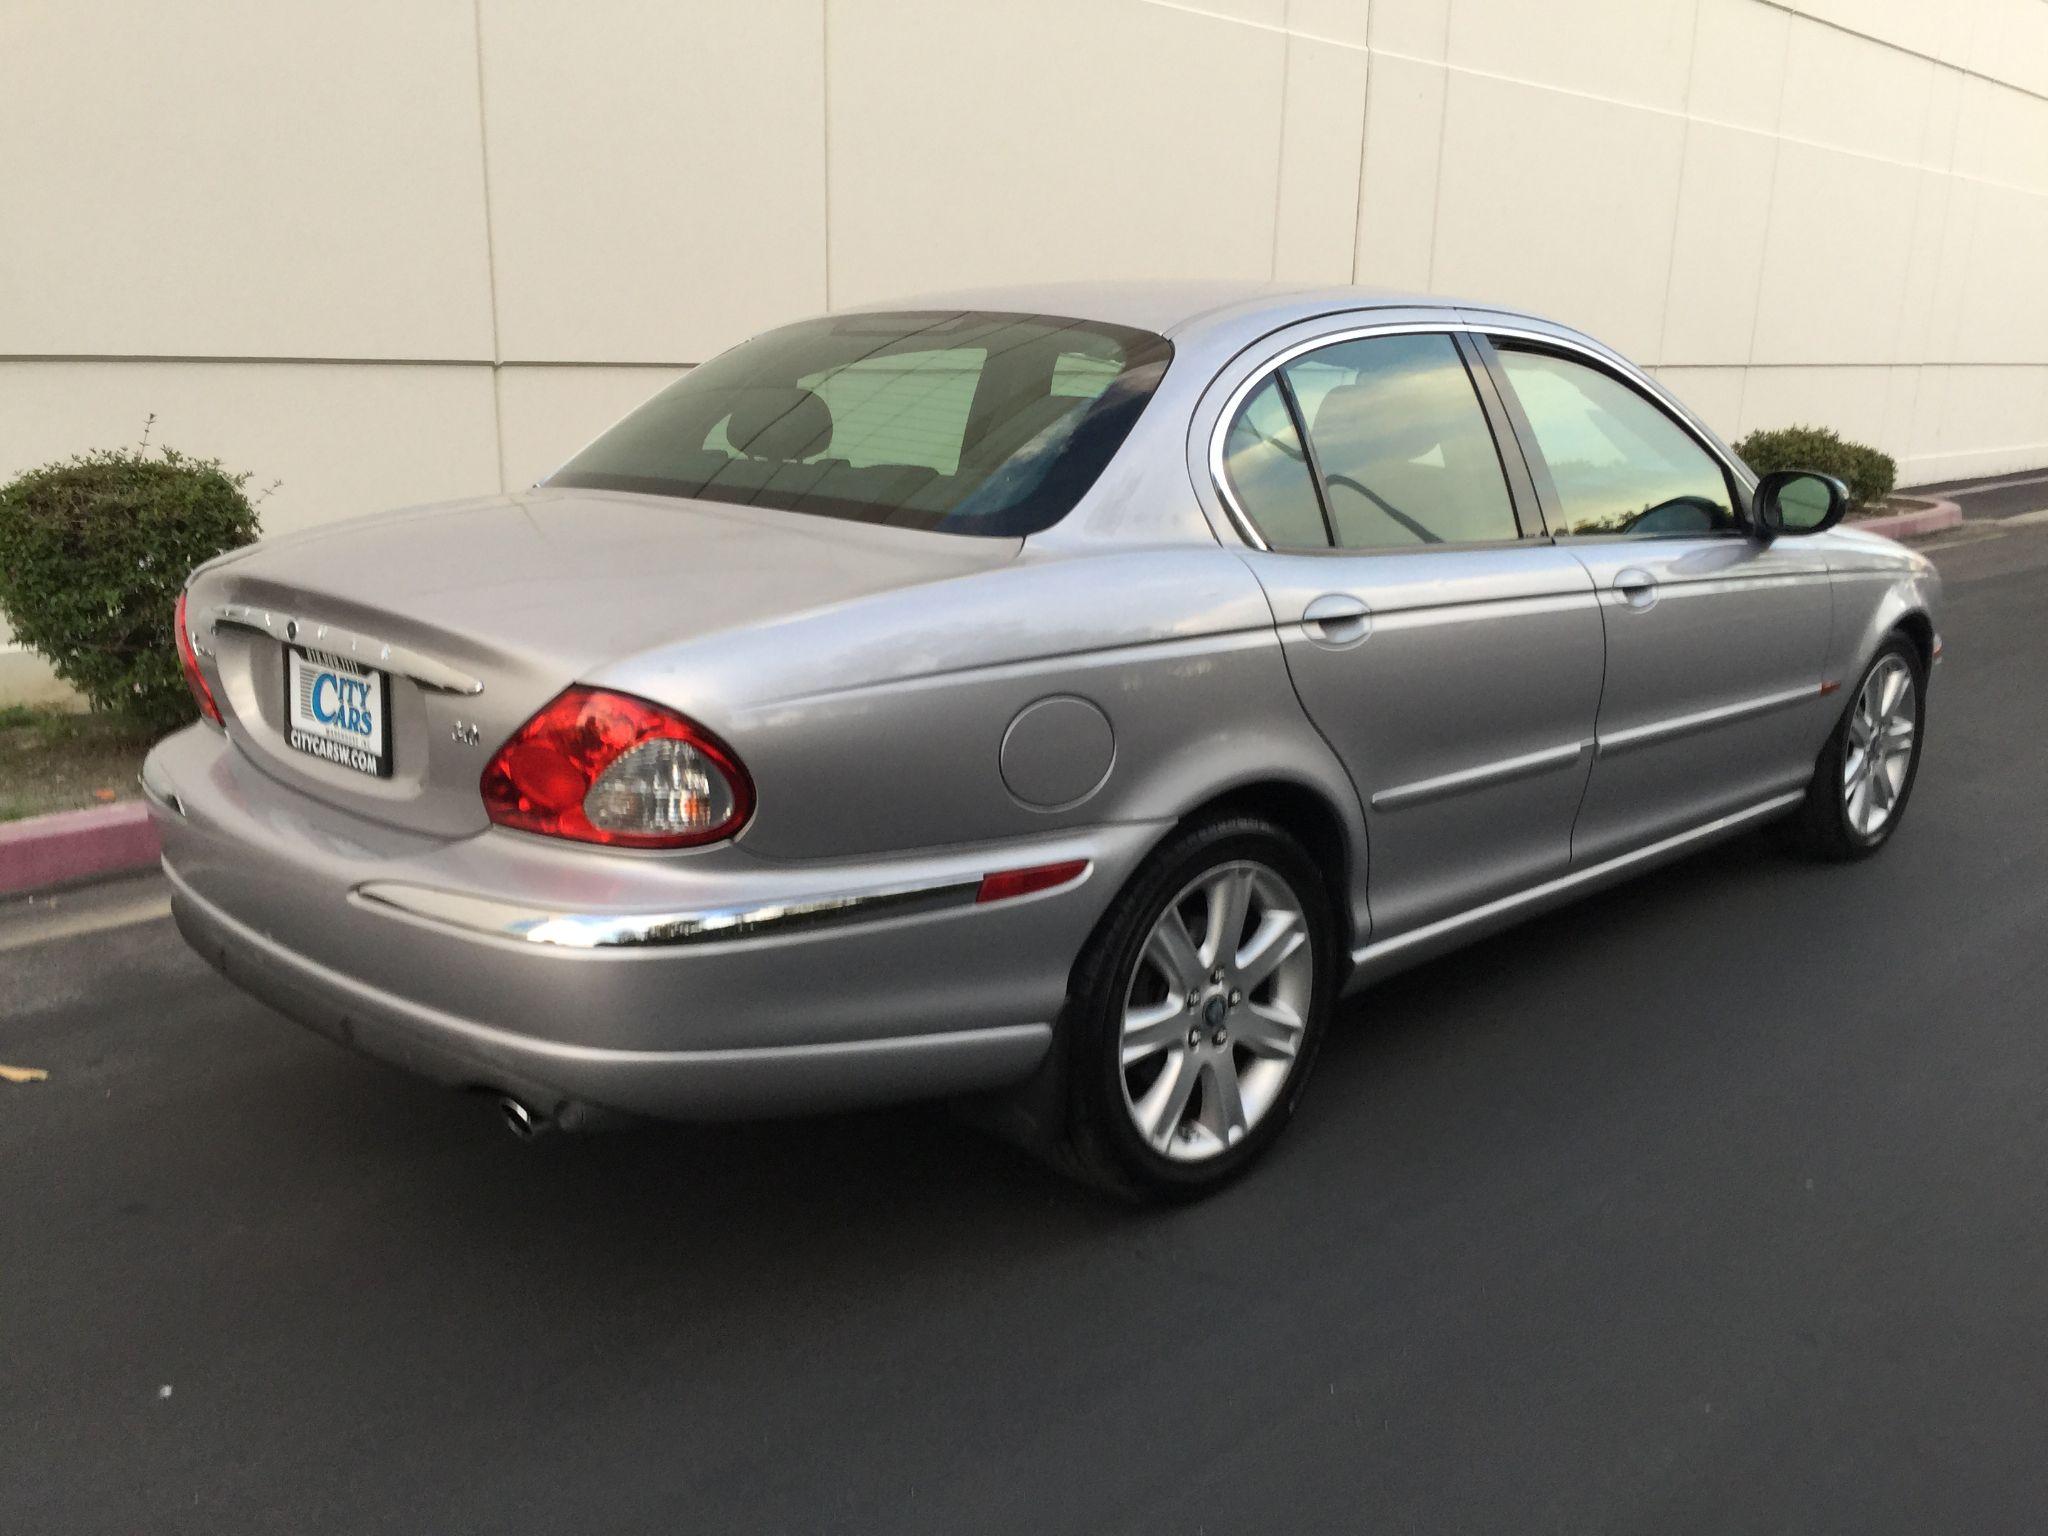 Used 2003 Jaguar X-TYPE 3.0L at City Cars Warehouse INC